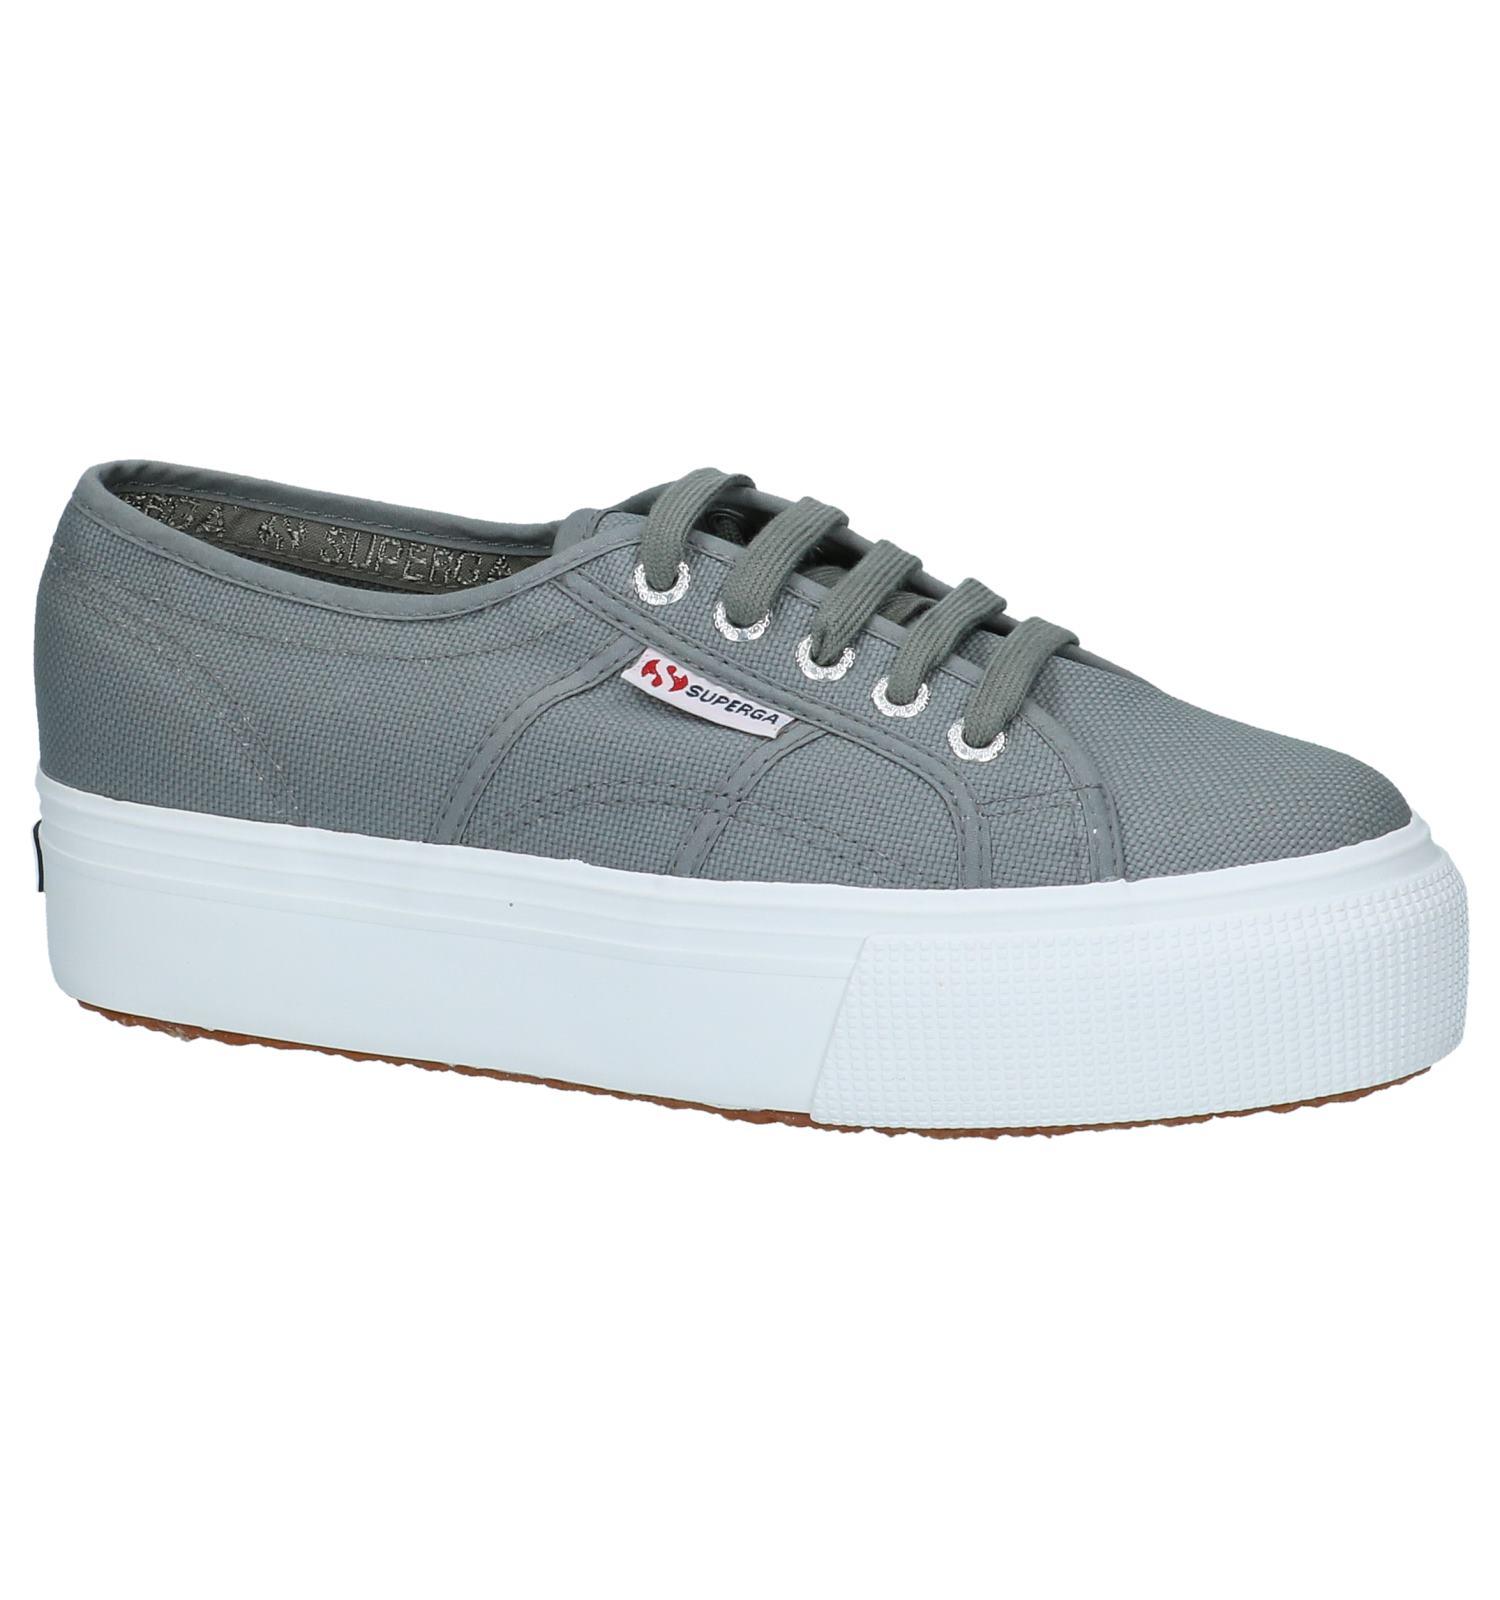 e362f1c1640 Sneakers met Plateauzool Superga Grijs | TORFS.BE | Gratis verzend en retour